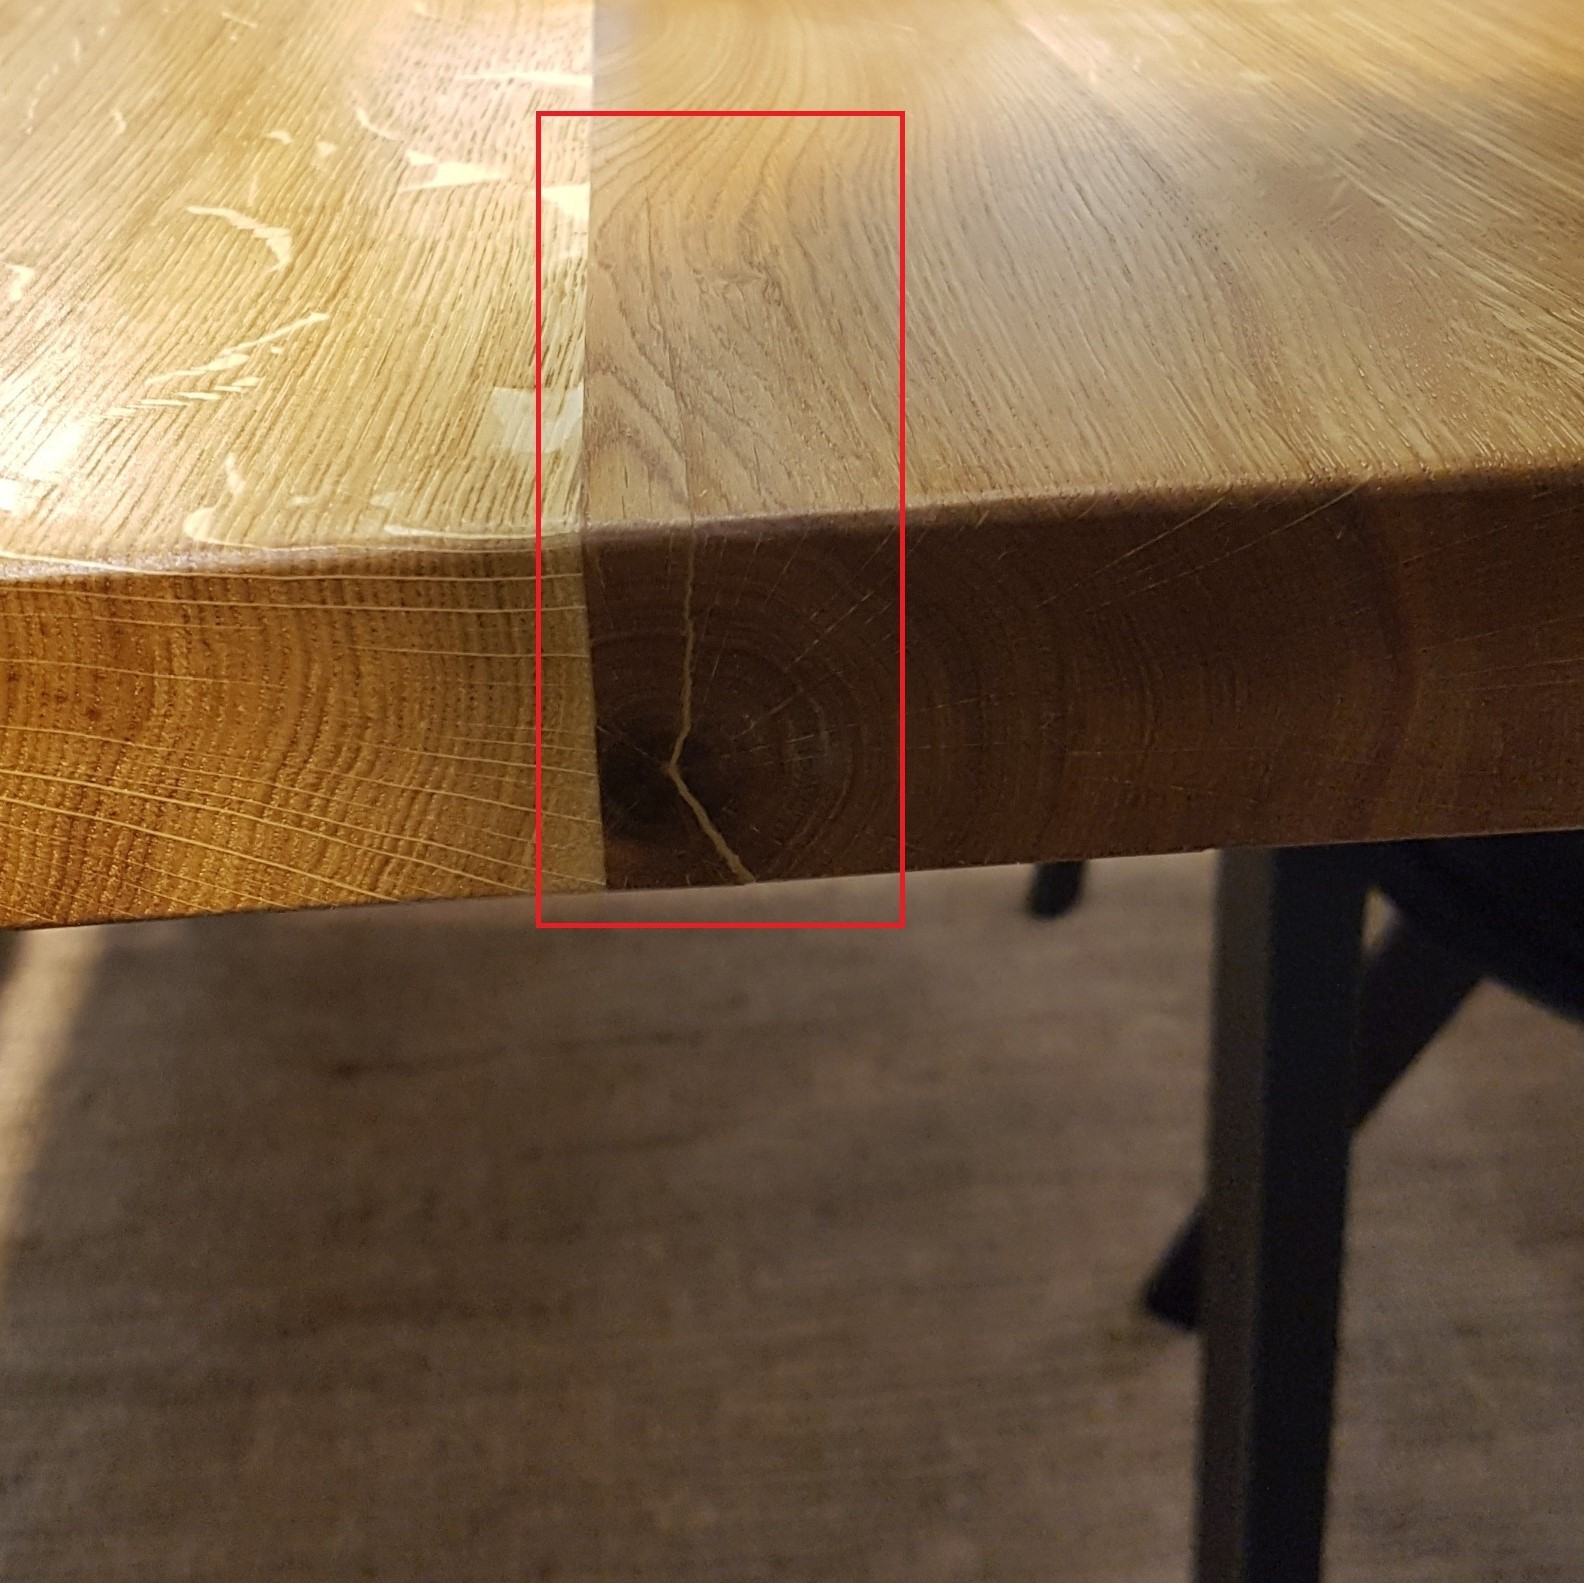 lankkupöytä, lankkupöytä ale, lankkupöytä jalat, lankkupöytä metallijalat, lankkupöytä metallijaloilla, lankkupöytä ulos, lankkupöytä tammi, lankkupöytä terassille, lankkupöytä valkoinen, lankkupöytä ja penkit, lankkupöytä valkoinen, lankkupöytä ja penkit, lankkupöytä mittatilauksena, lankkupöytä olohuoneeseen, lankkupöytä saarni, lankkupöytäryhmä, tamminen lankkupöytä,